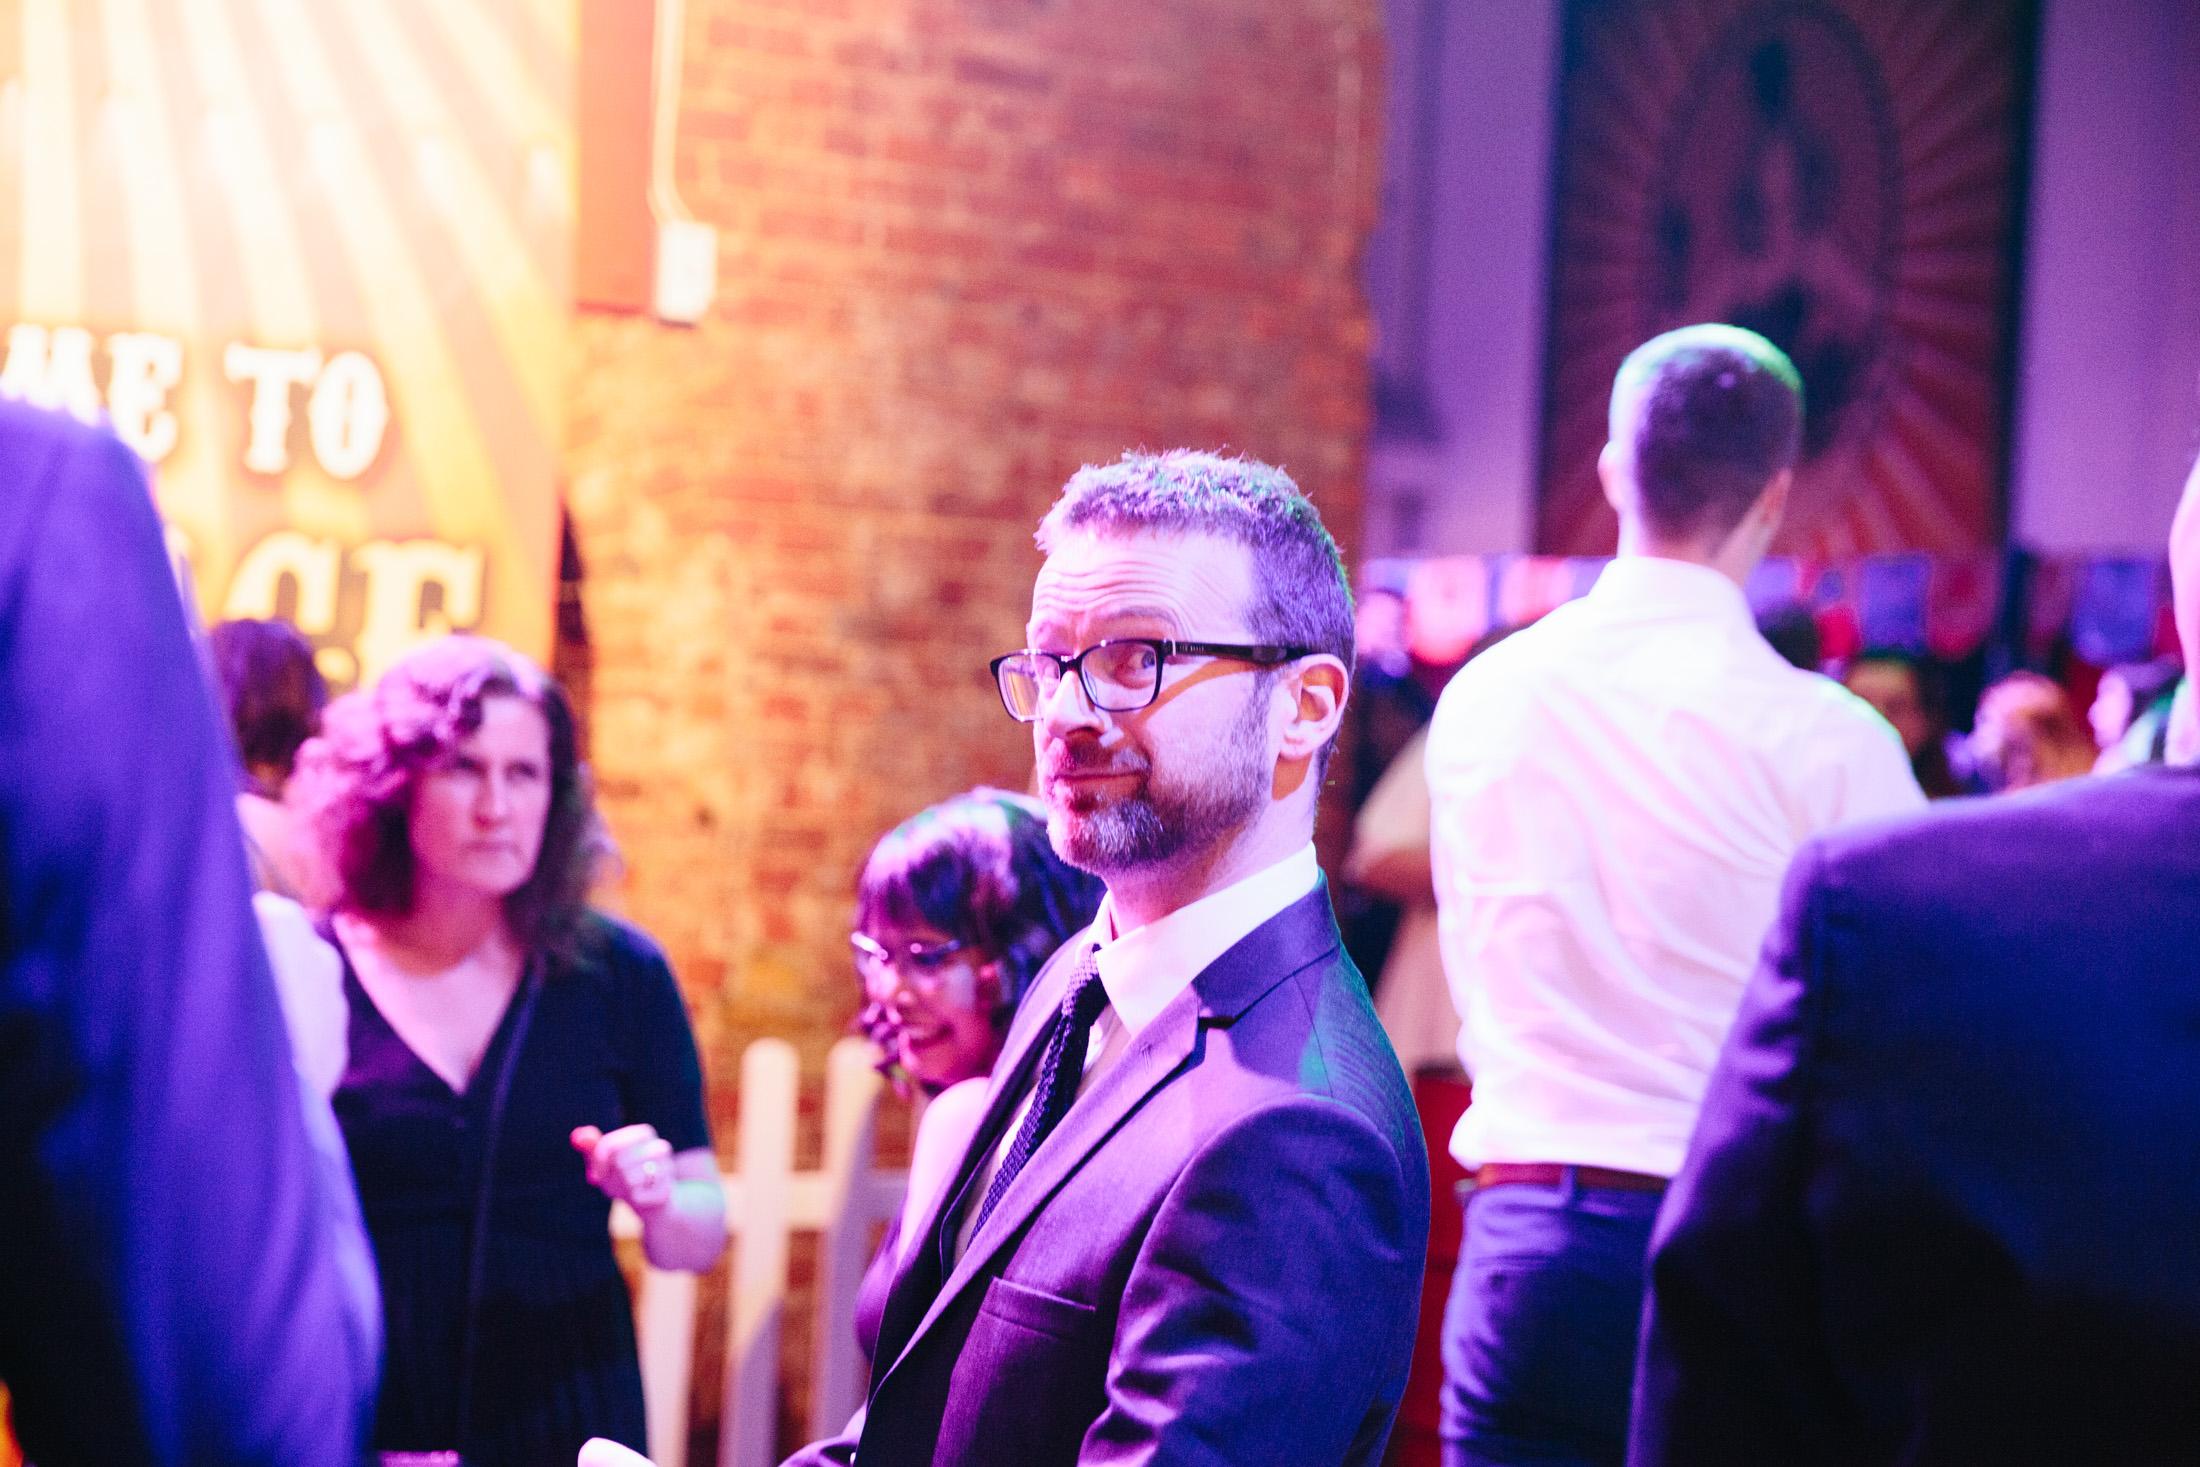 AL-event-photographer-london-9.jpg